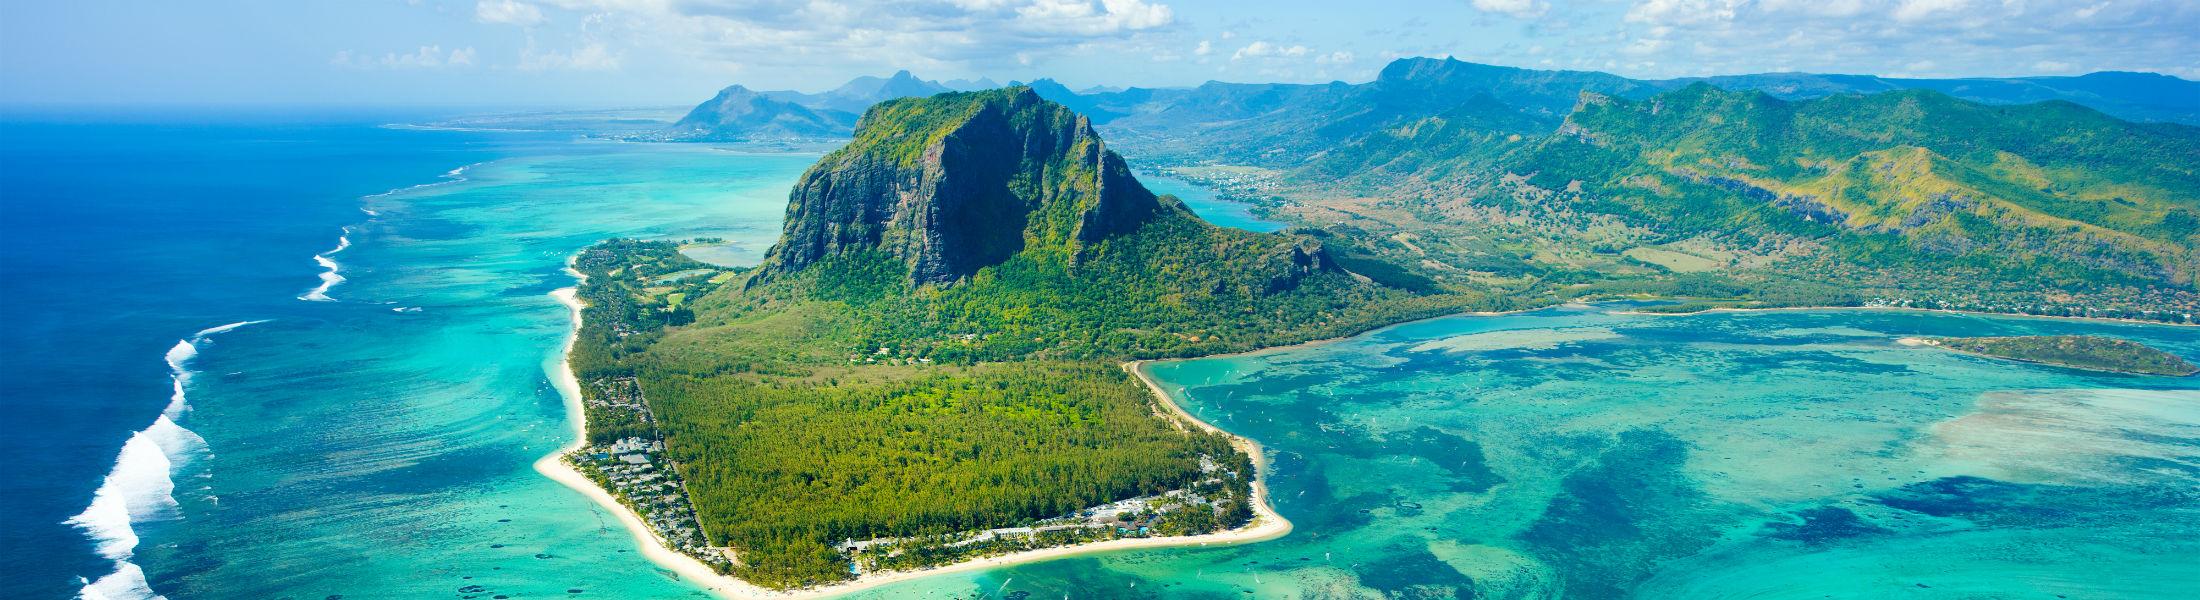 Mauritius Isalnd aerial View